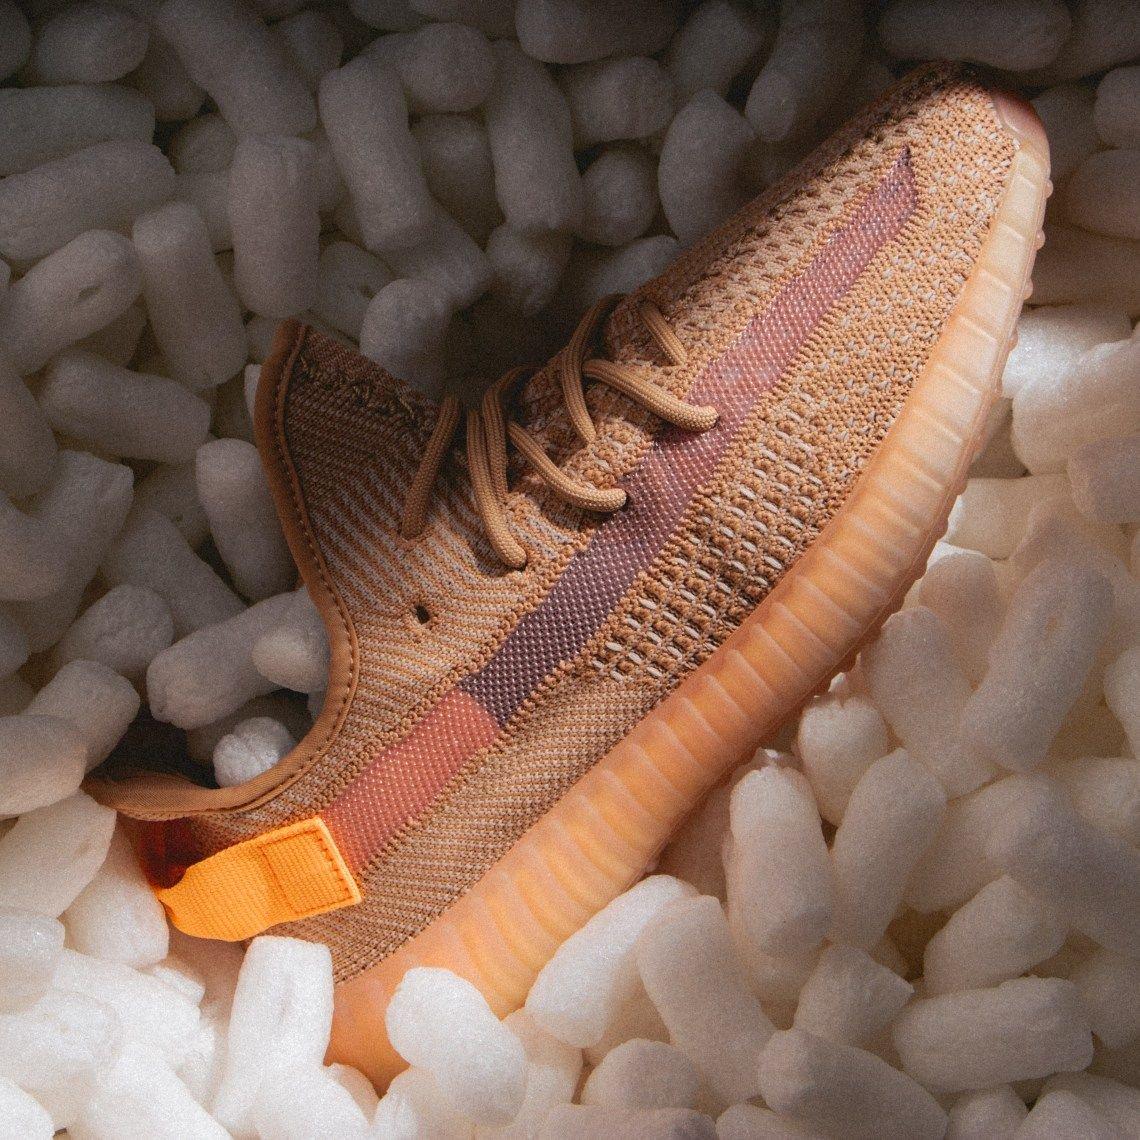 2ae03ad396c92f Adidas UK   https   bit.ly 2EbxFSo Foot Locker Kids    https   bit.ly 2HmResU Foot Locker Infant   https   bit.ly 2w4uYxe pic. twitter.com RWVul0z6zj